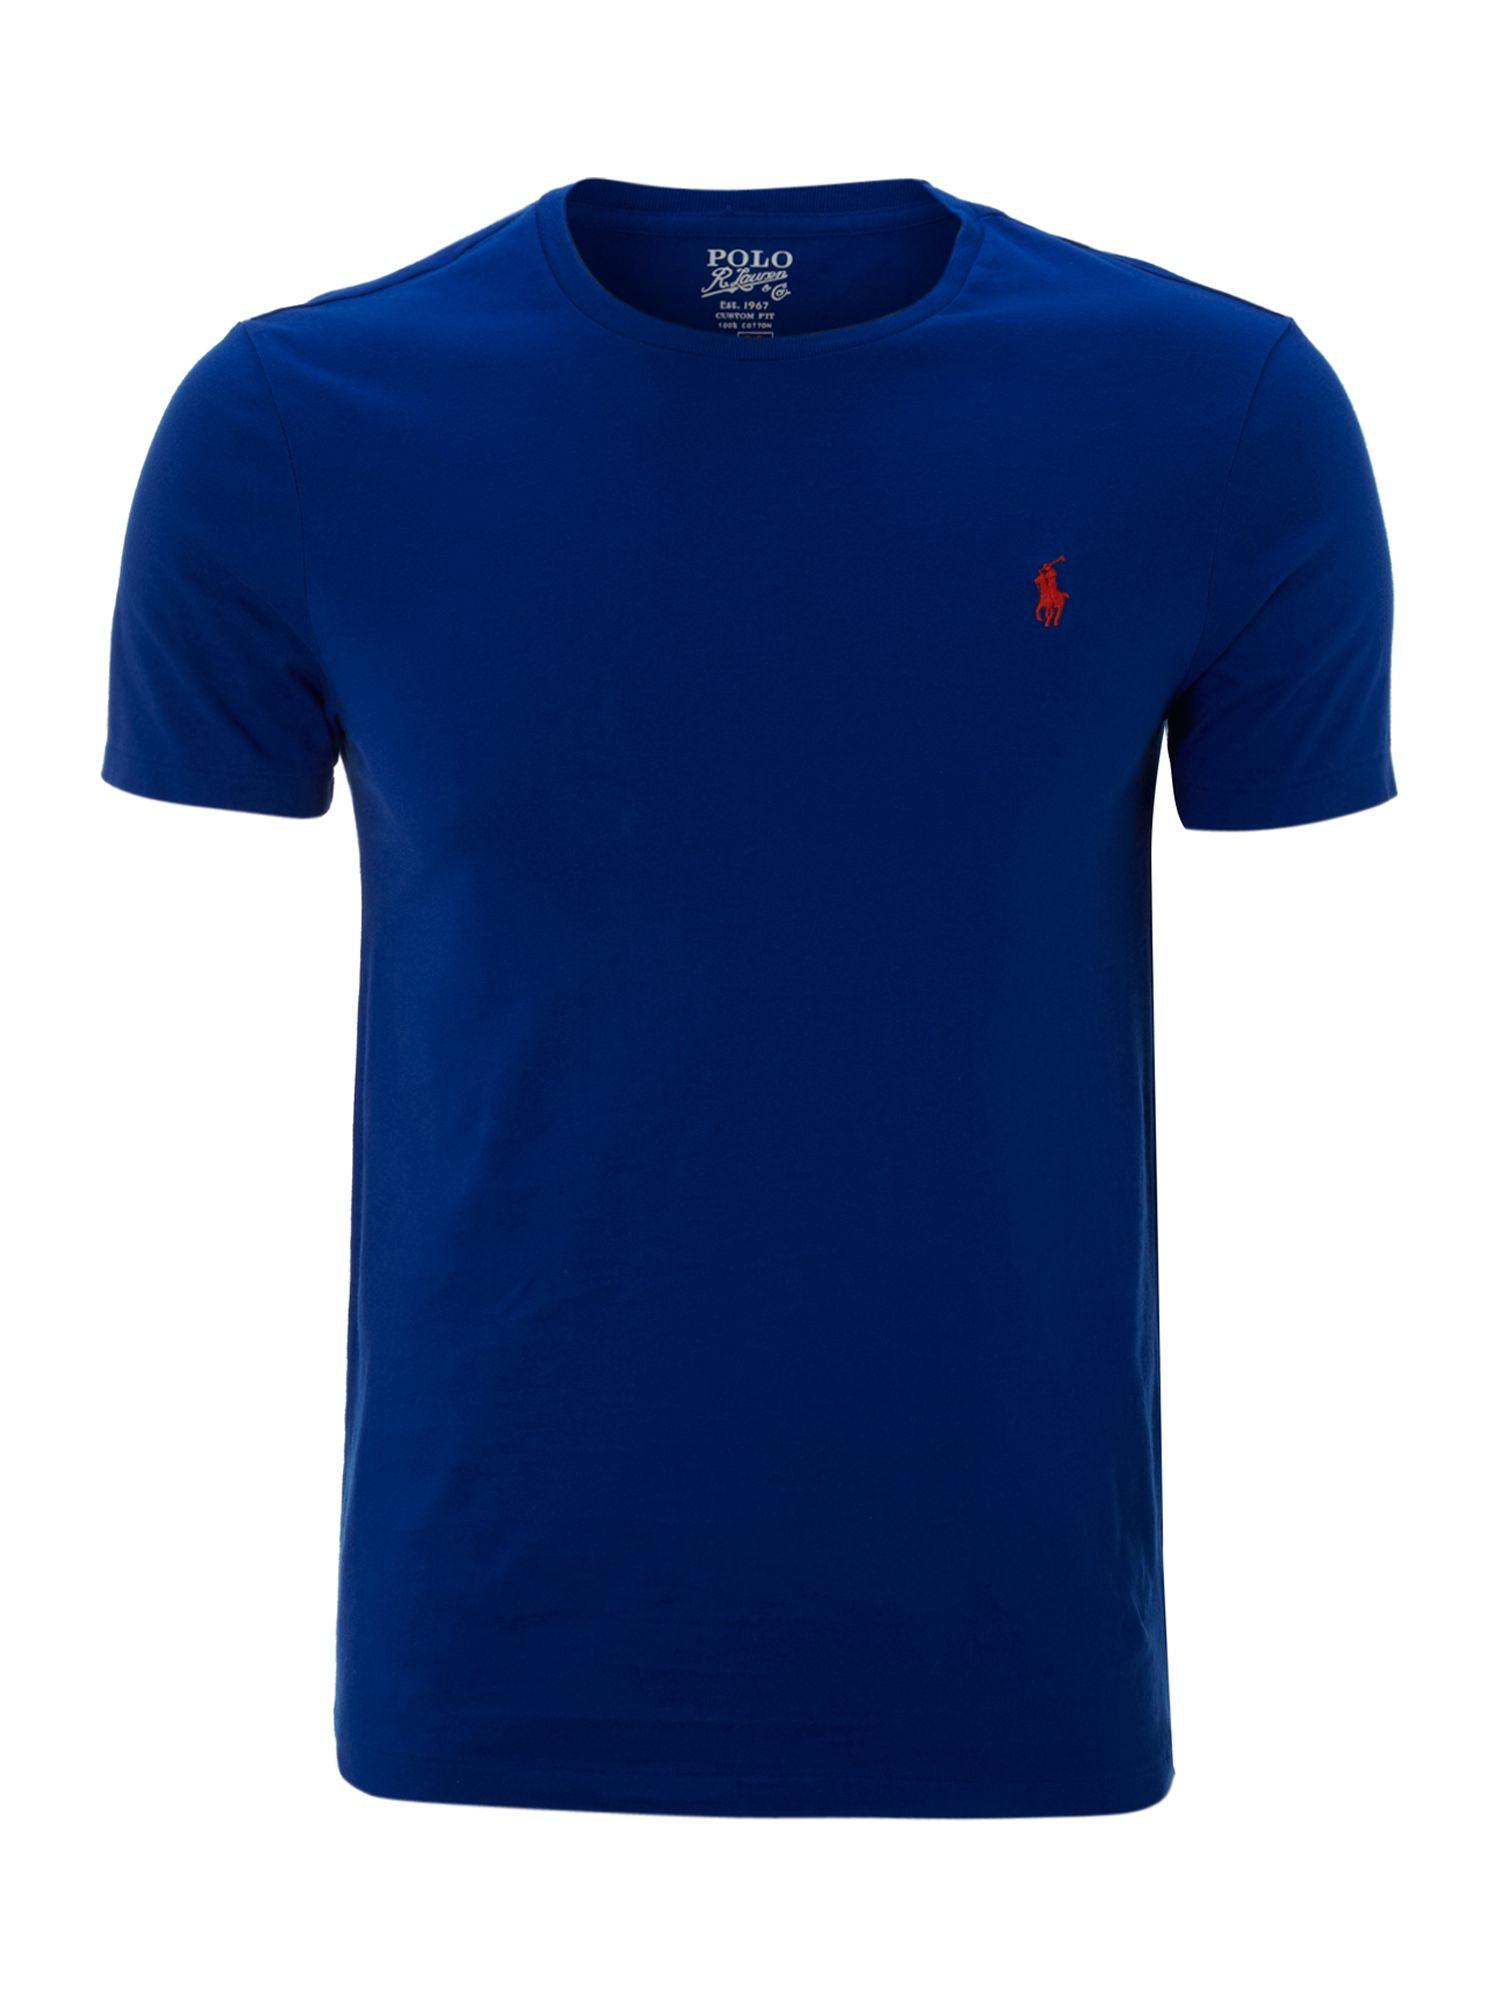 Polo Ralph Lauren Vintage Printed Crew Neck T Shirt In